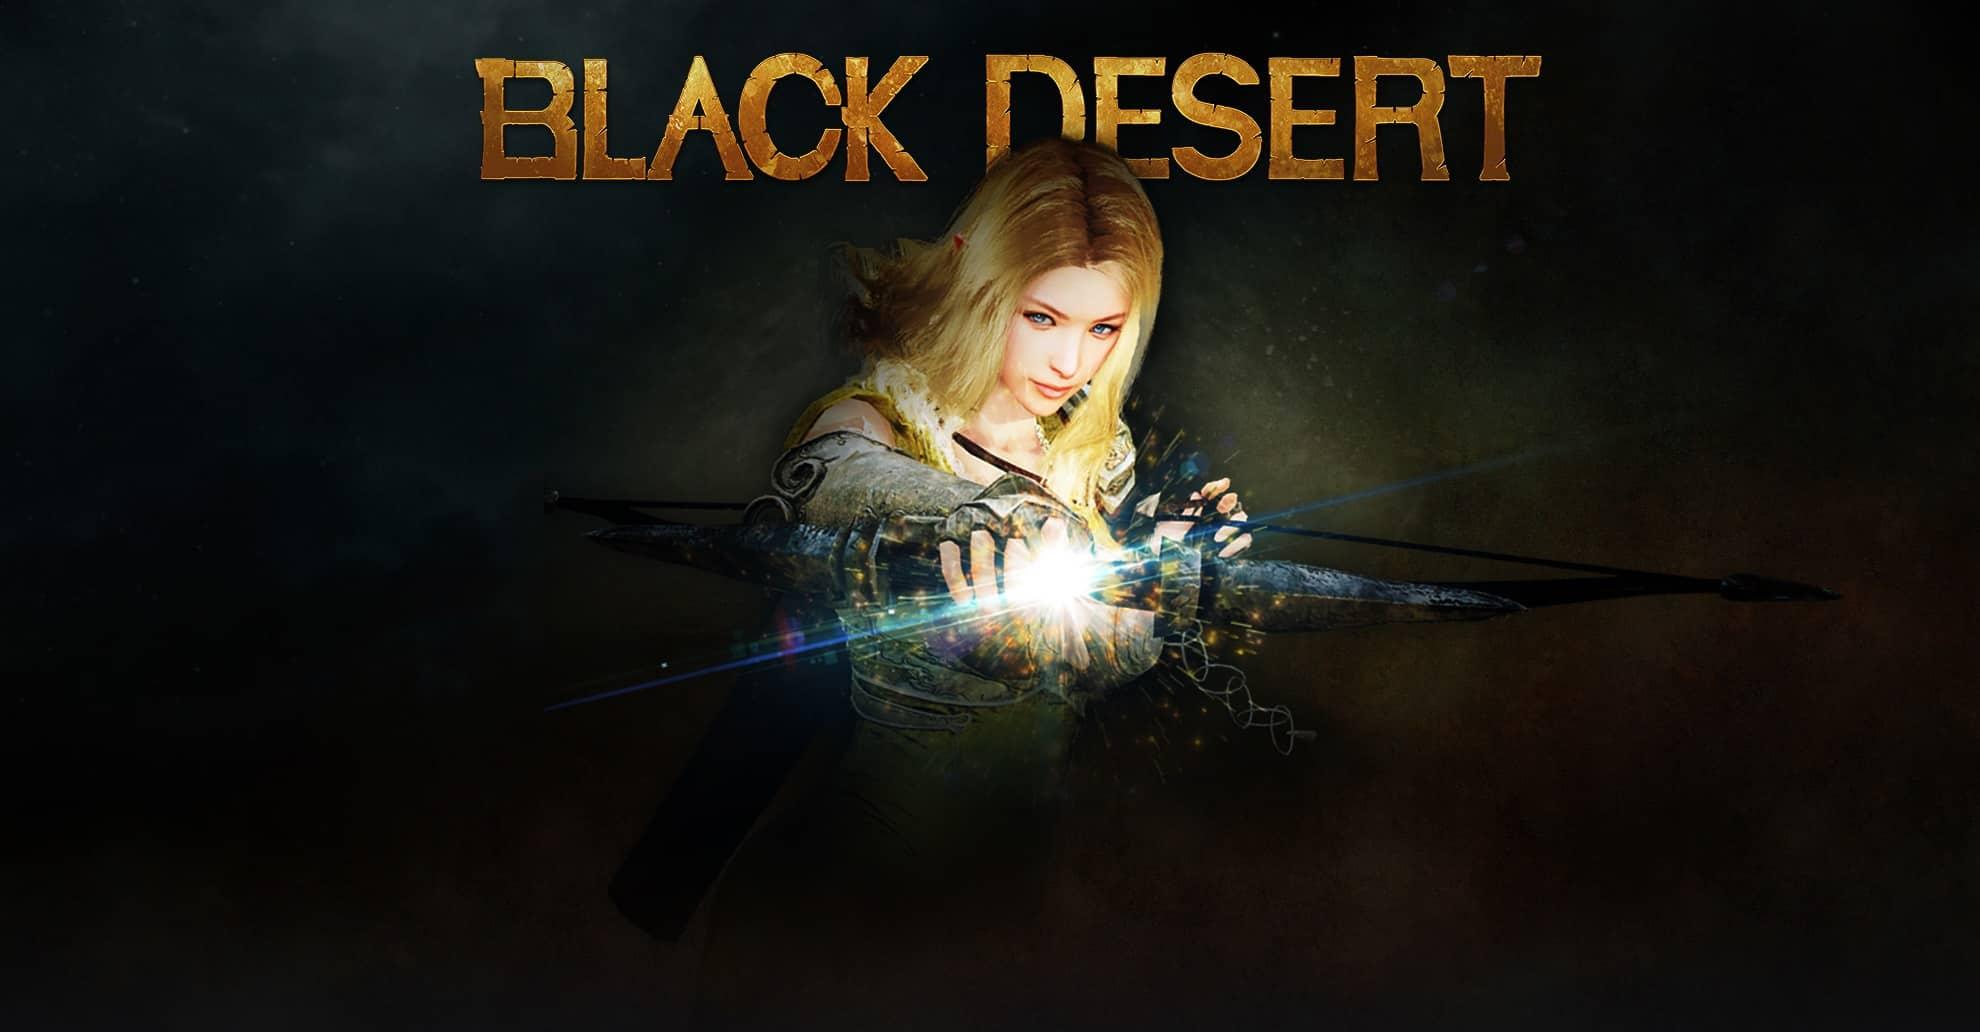 [BLACK DESERT ONLINE] Live ce soir à 18h20/18h30 sur Black Desert Online